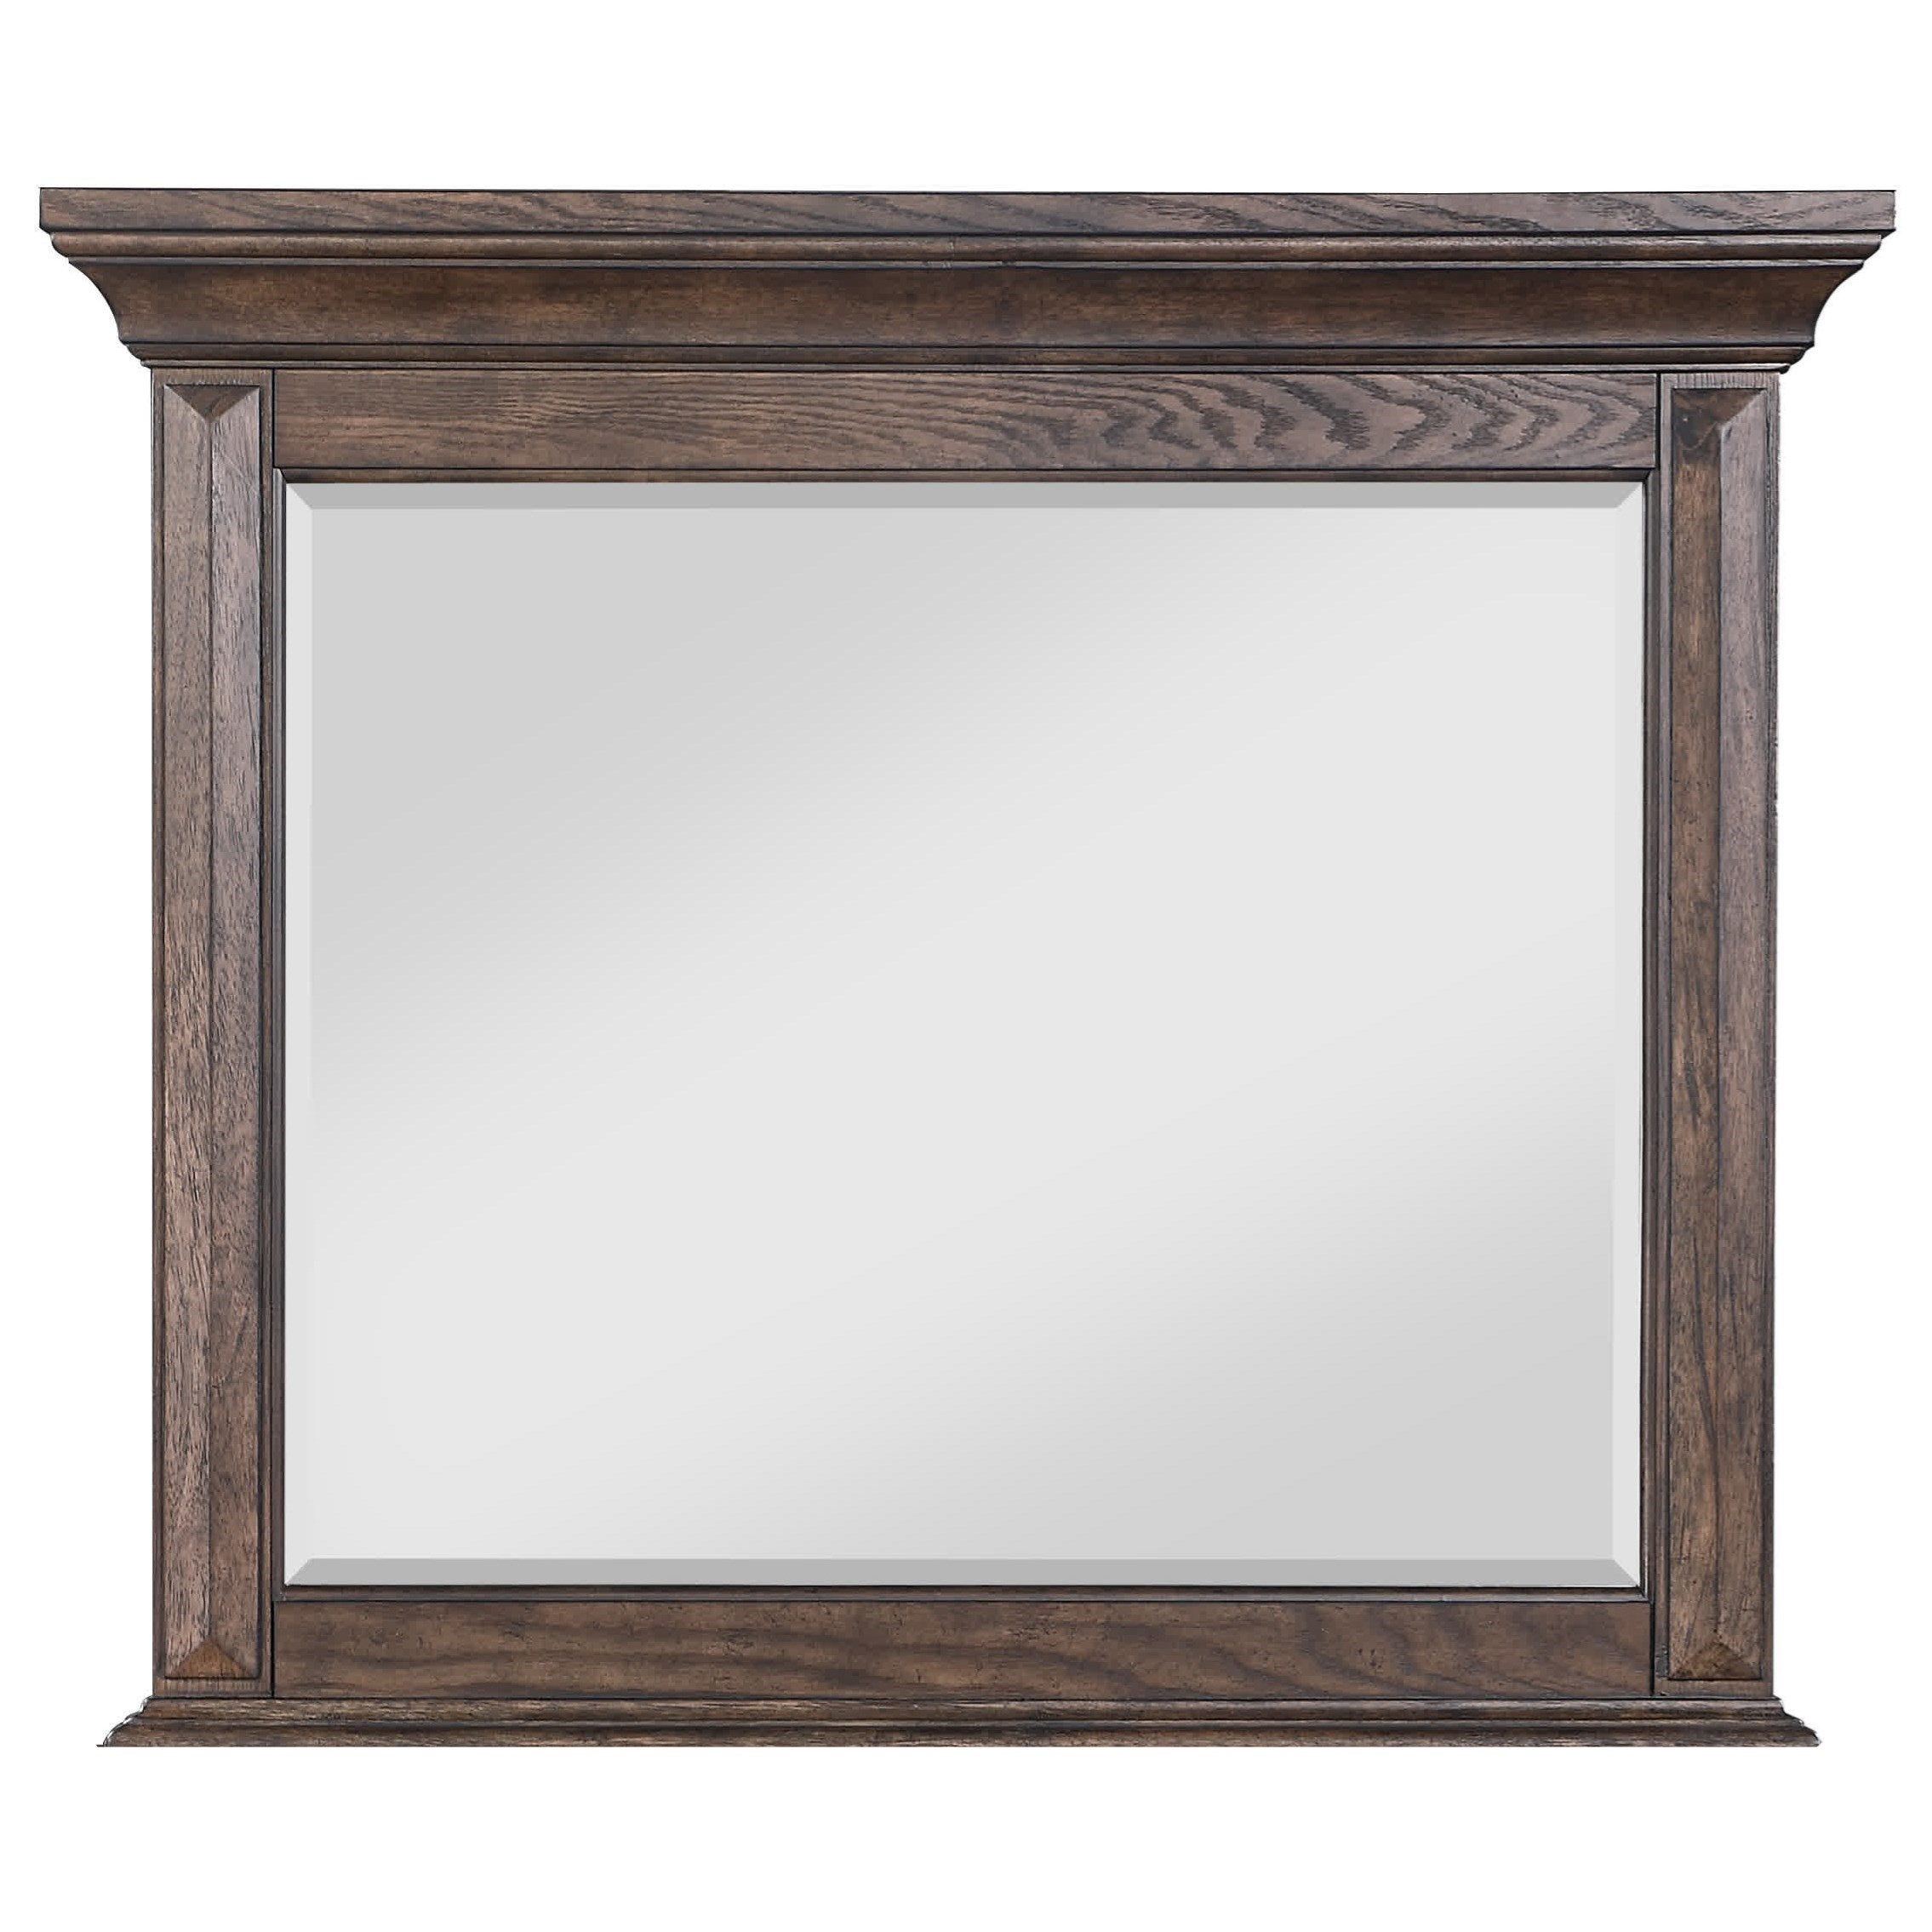 Mar Vista Mirror by New Classic at Wilcox Furniture